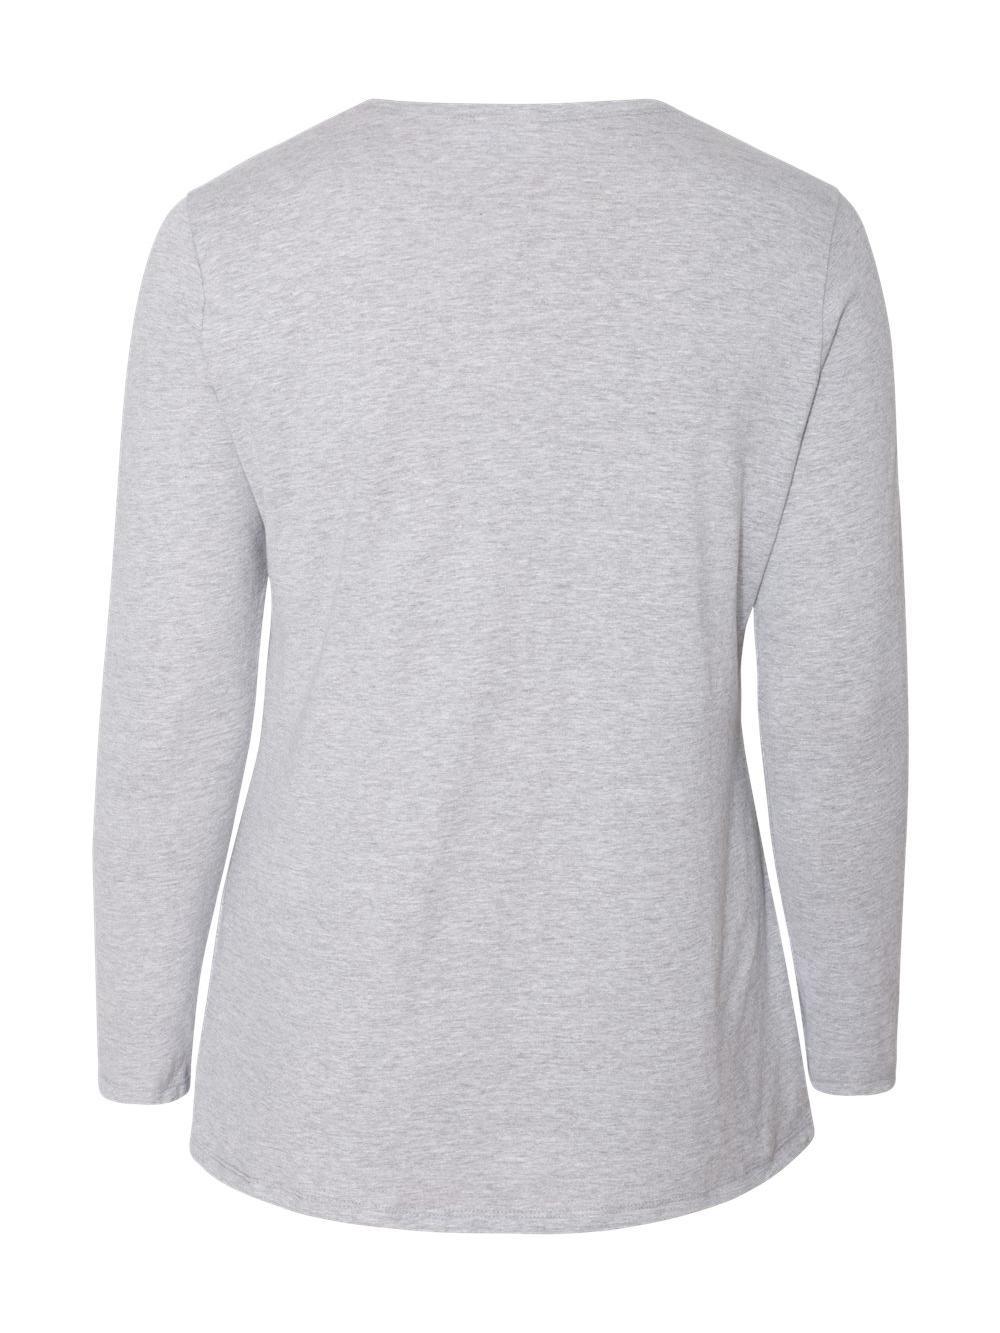 Just-My-Size-Women-039-s-Long-Sleeve-T-Shirt-JMS40 thumbnail 13